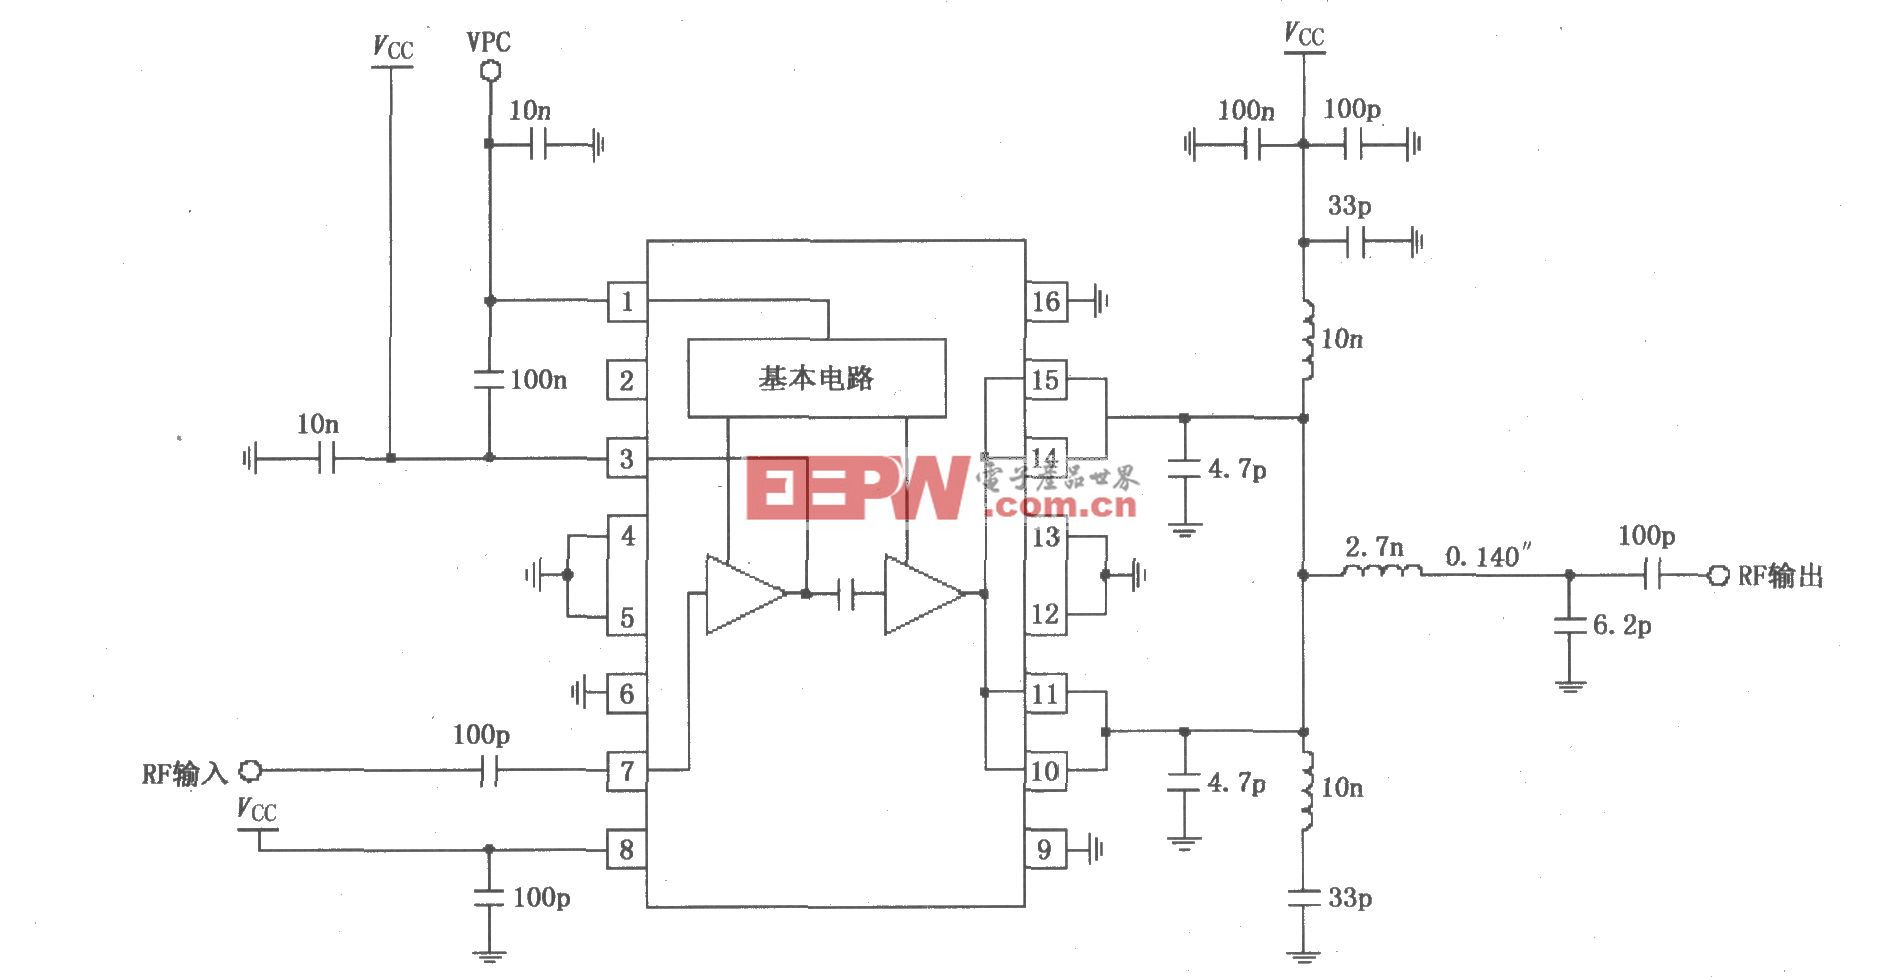 RF2131在4.0~4.8V电源供电时获得最佳功率和效率放大器电路